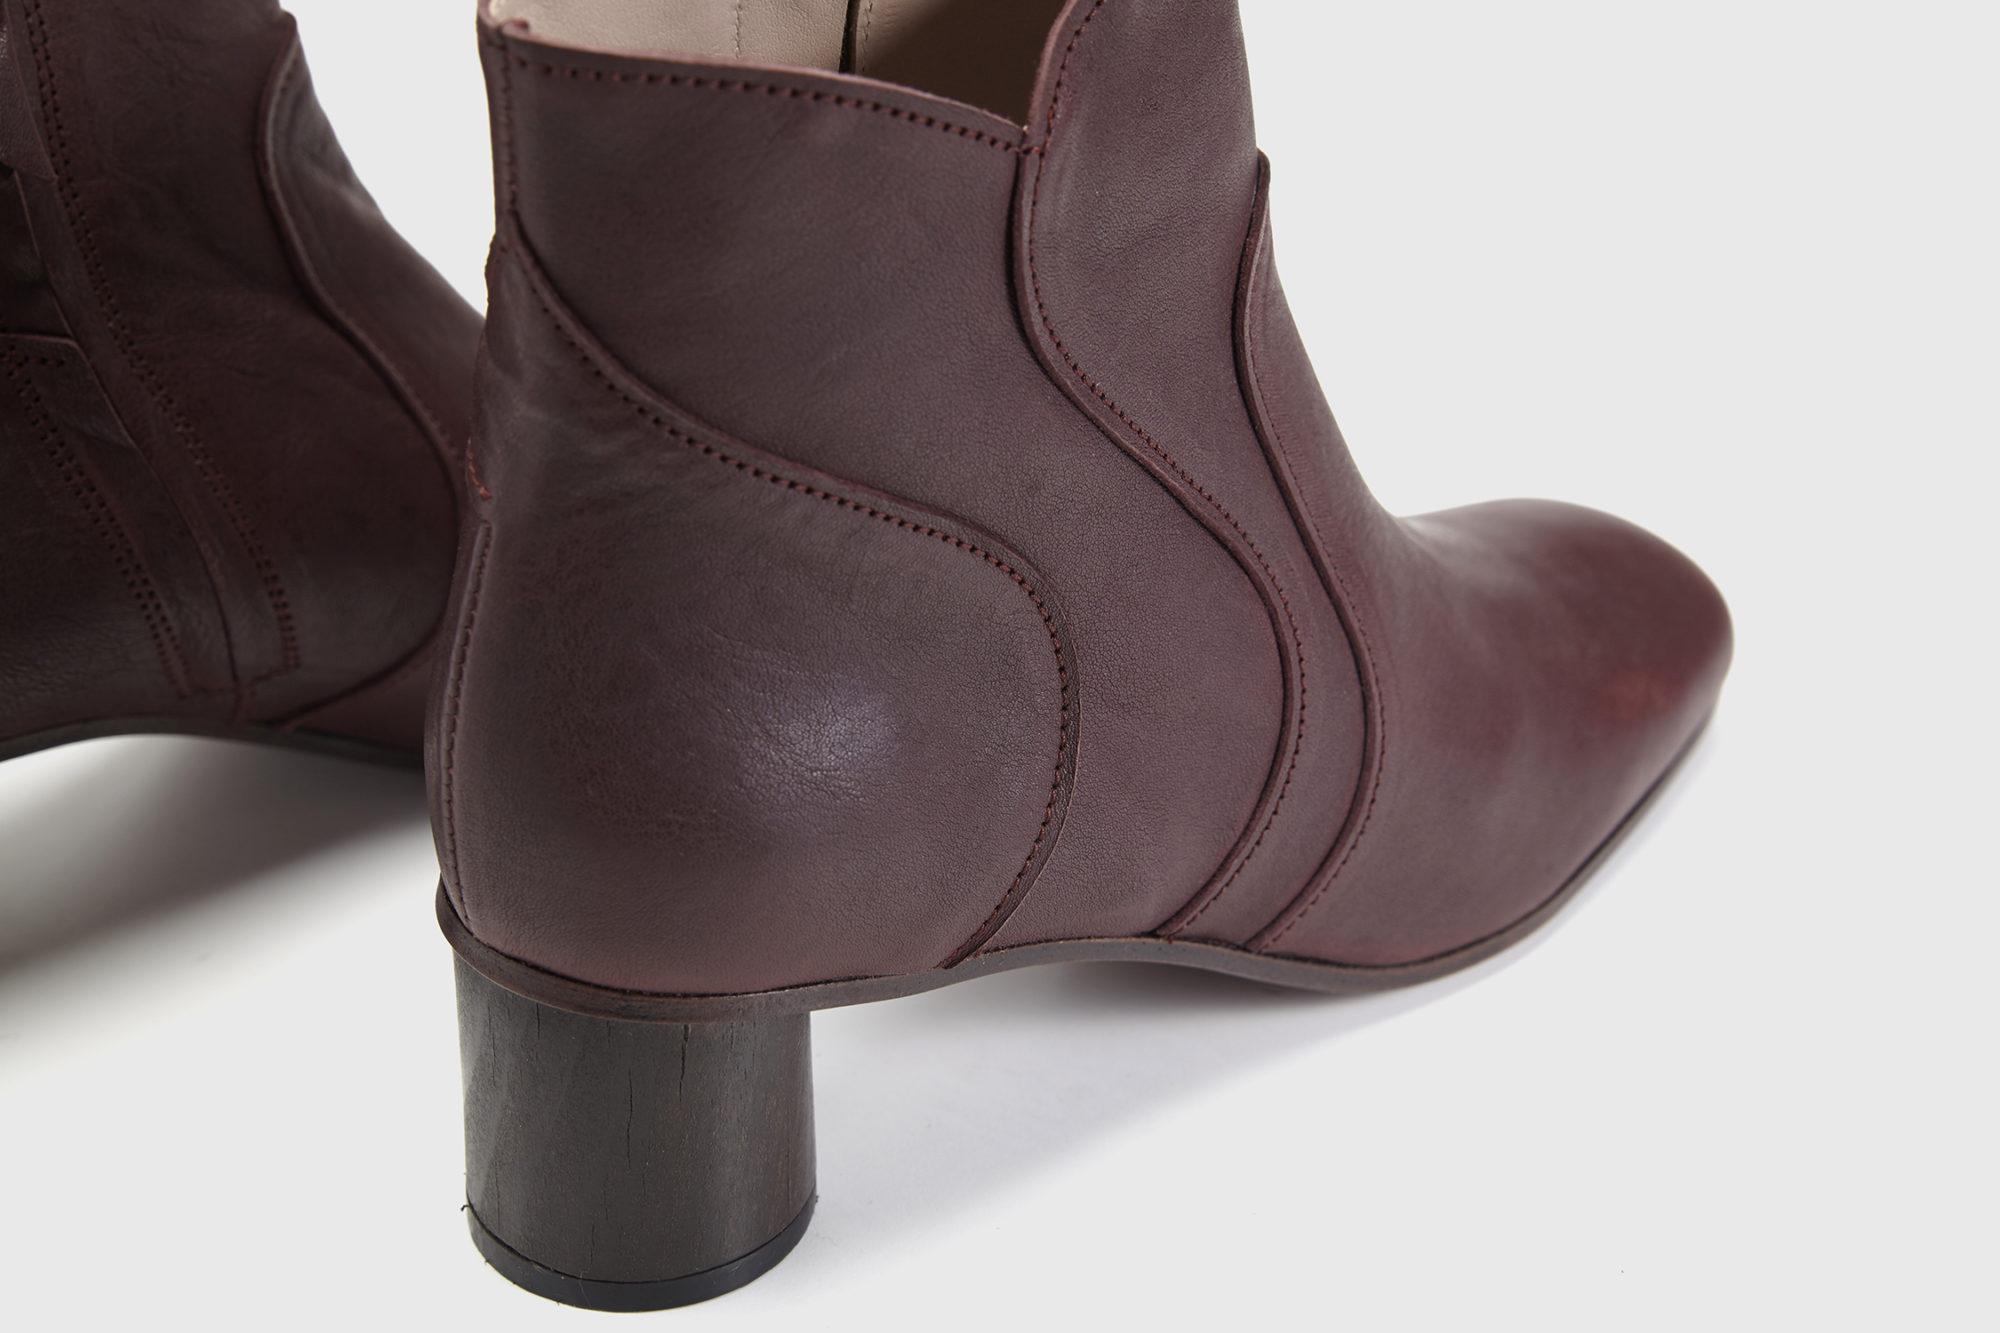 Dorotea botín de tacón medio Caroline color ciruela fw17 detalle